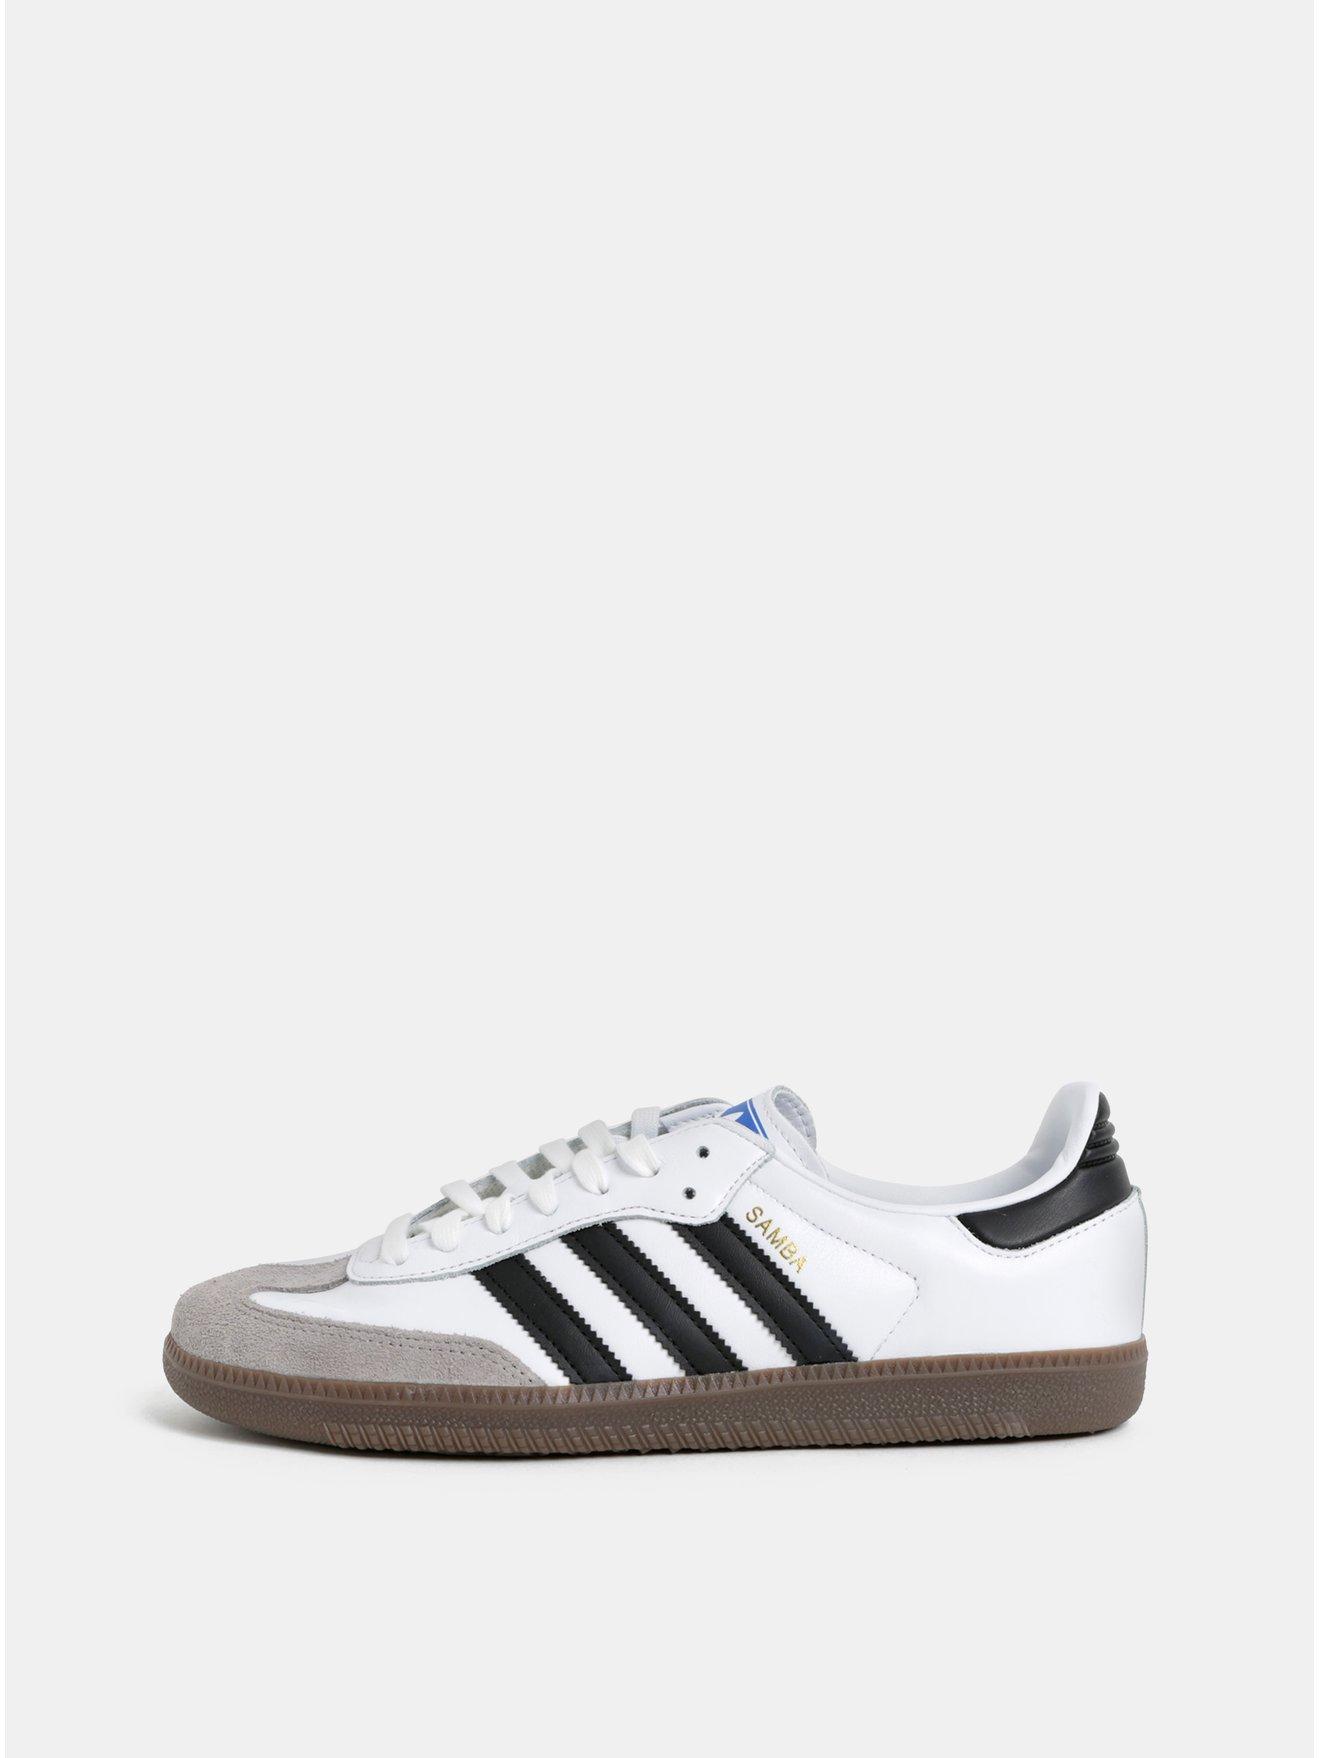 Bílé tenisky s detaily v semišové úpravě adidas Originals Samba